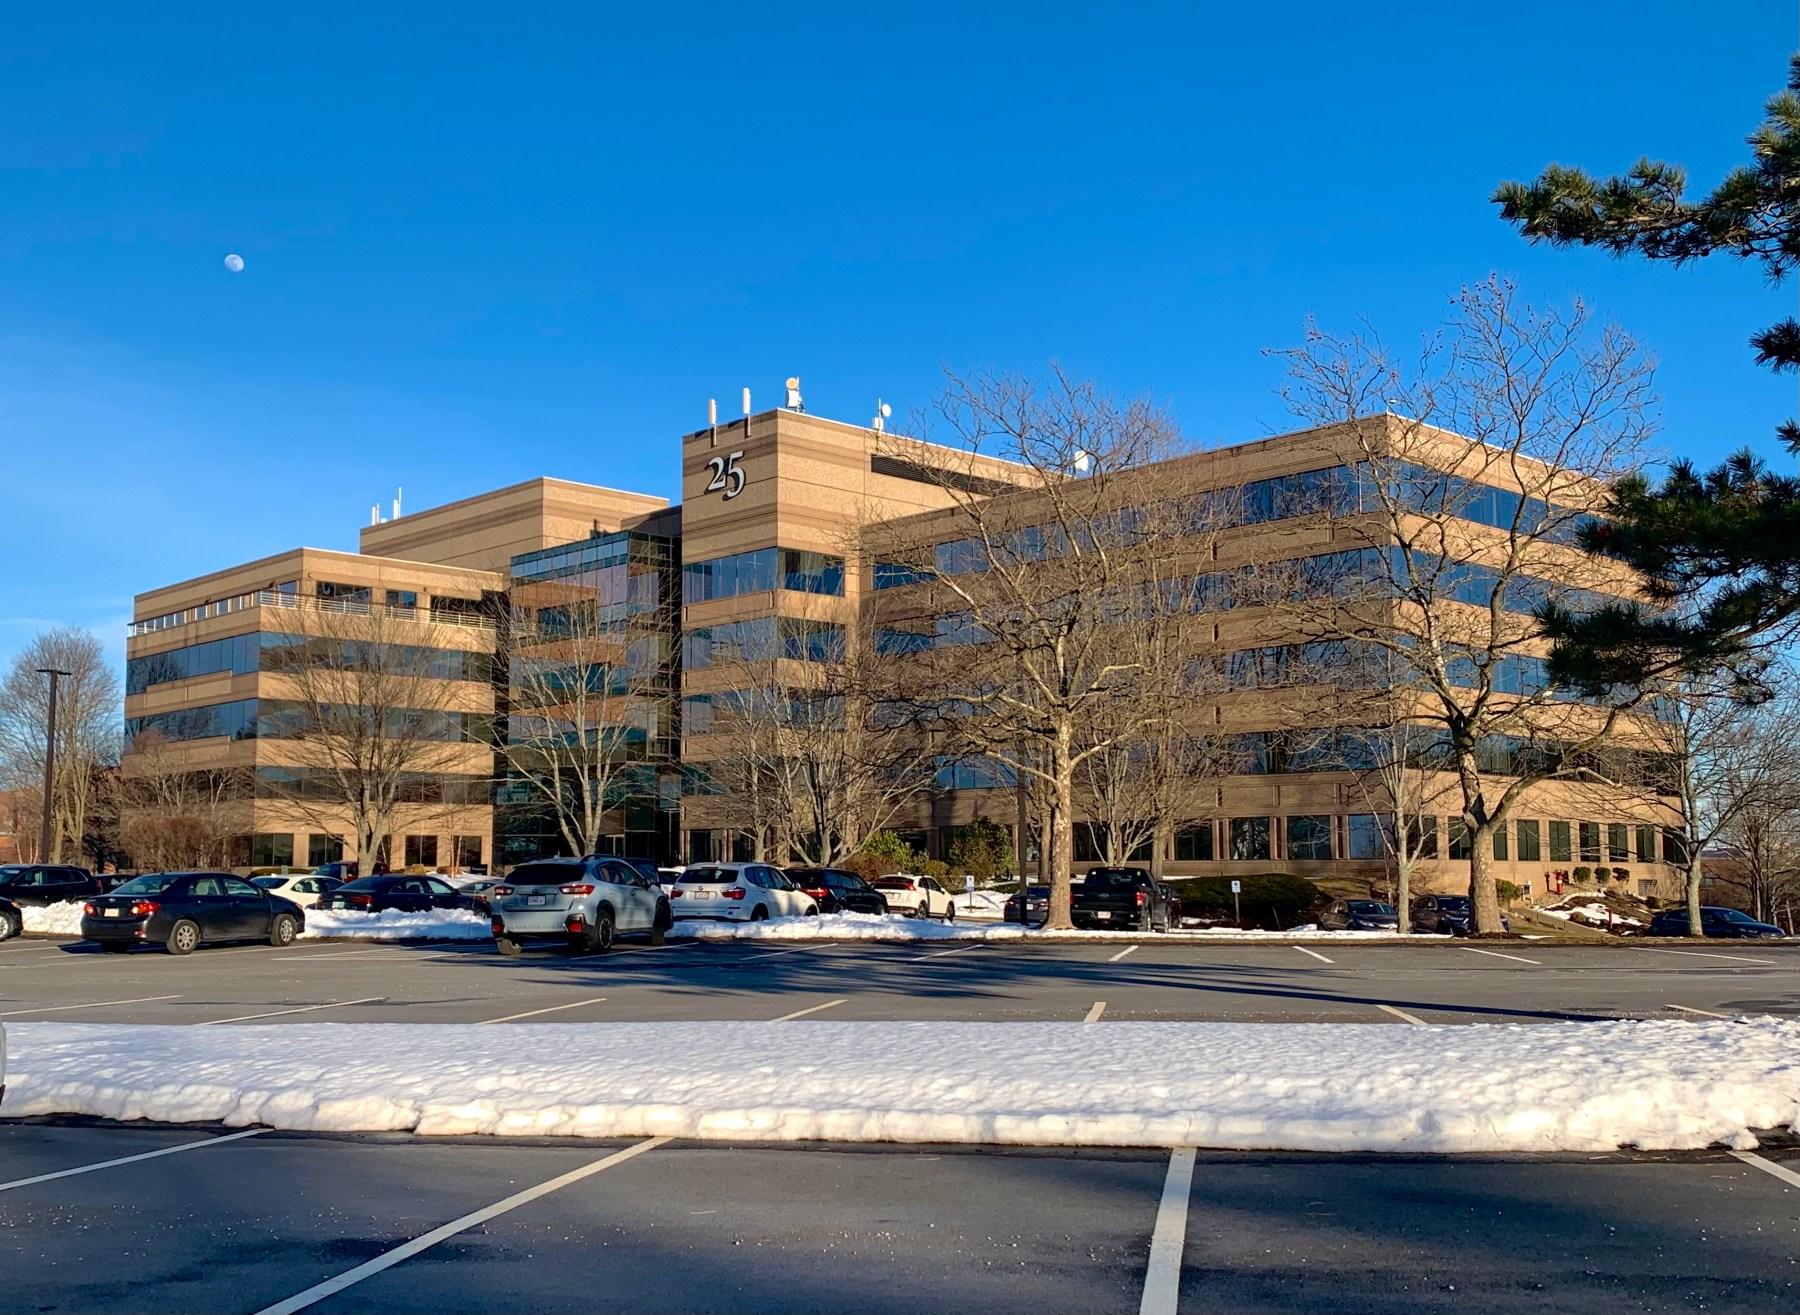 25 Burlington Mall Road, Burlington, MA